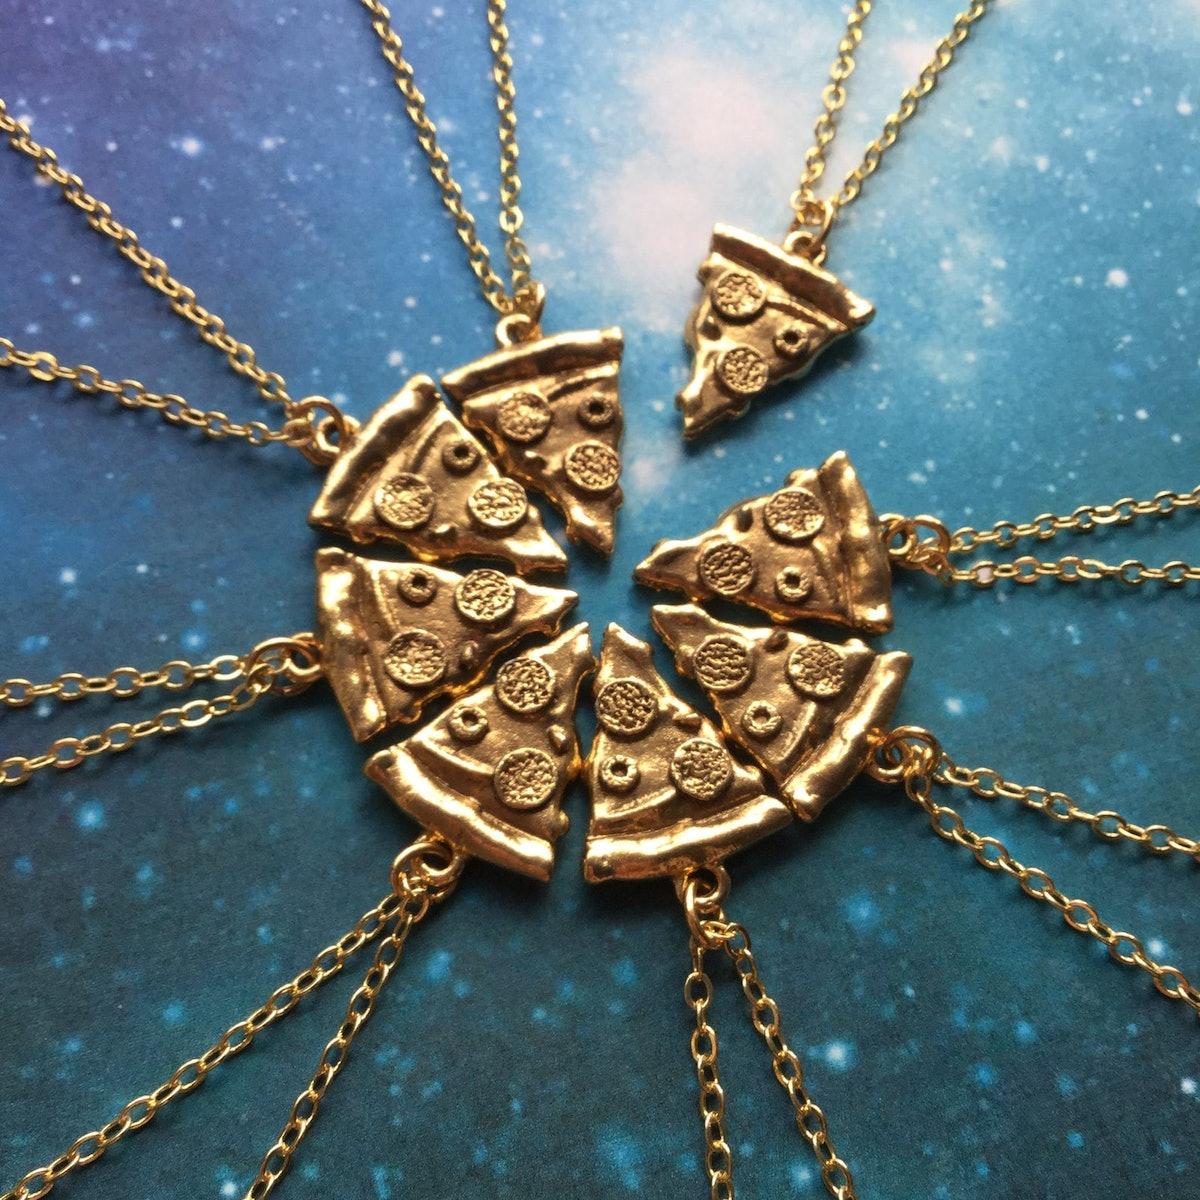 Gold Pizza Slice Friendship Necklaces